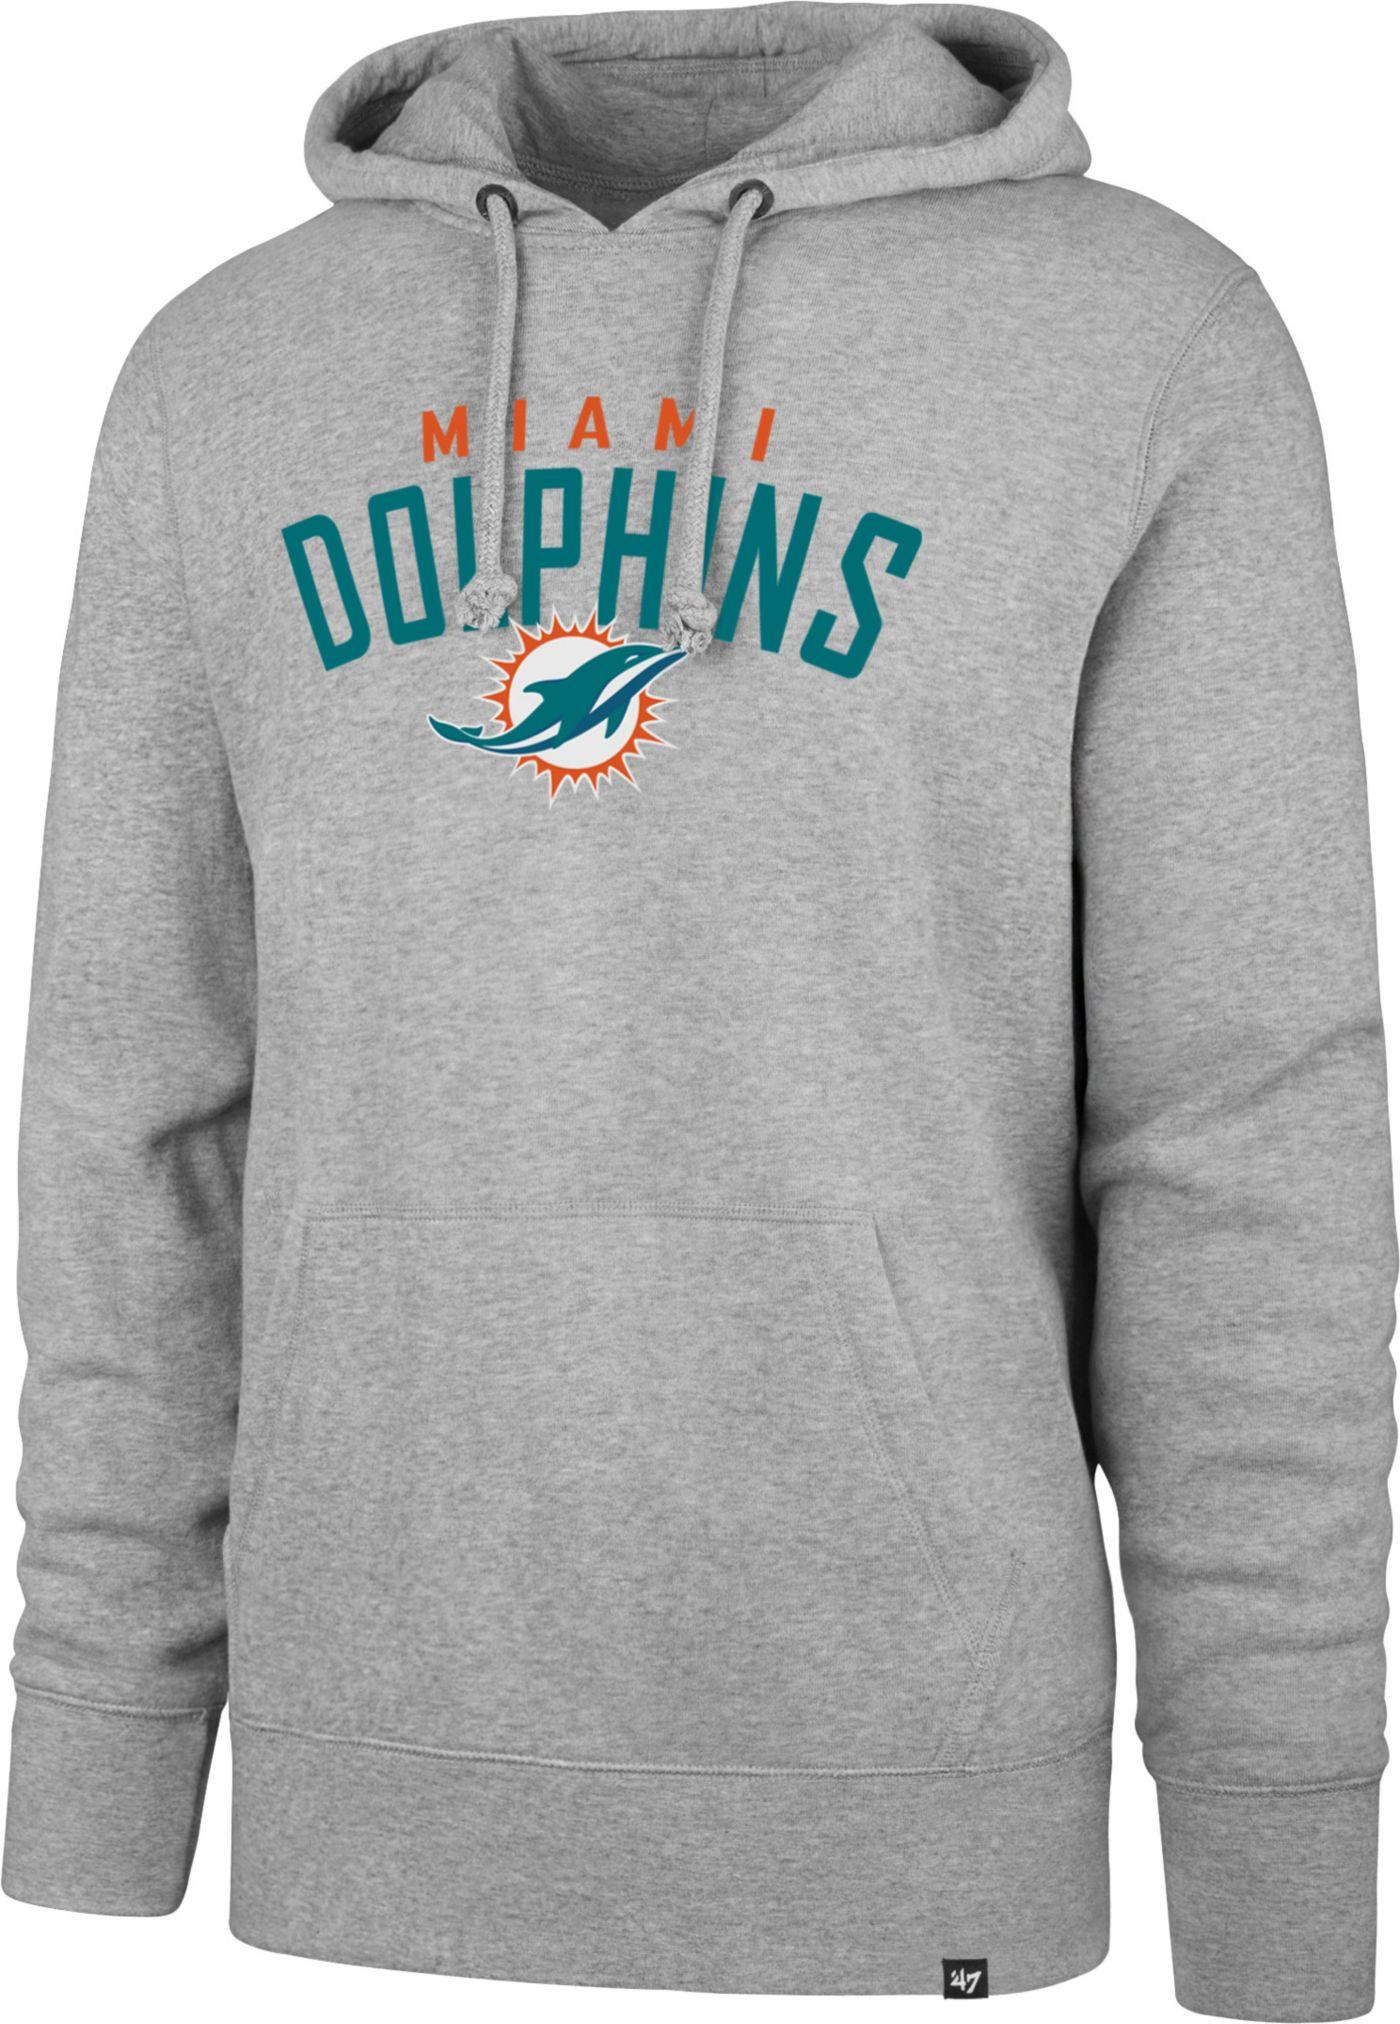 '47 Men's Miami Dolphins Headline Grey Hoodie